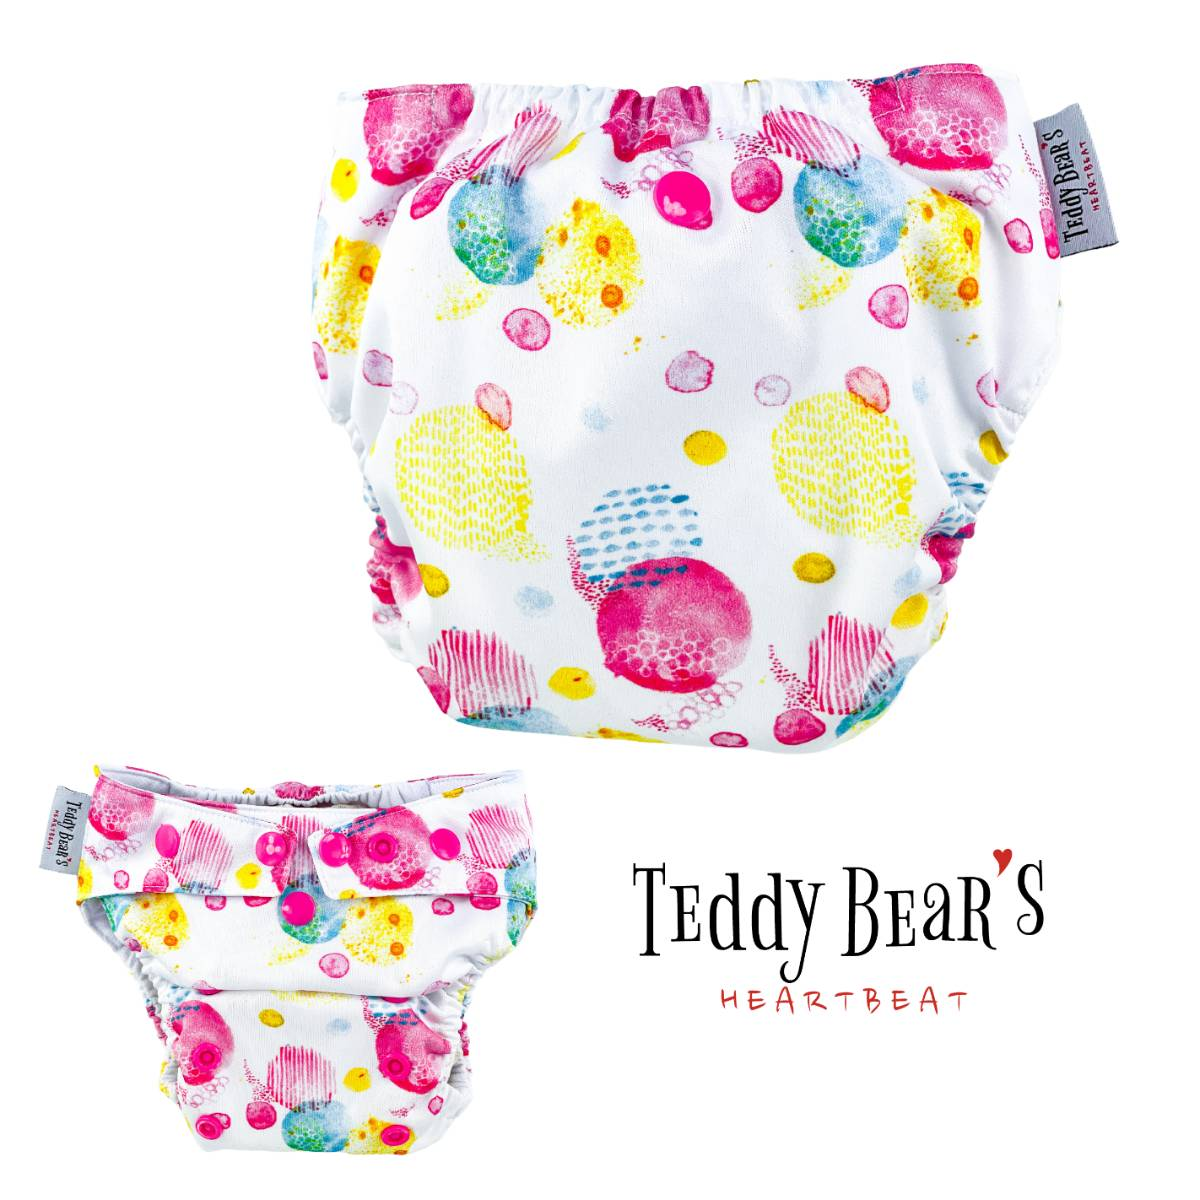 happy-bubbles-ergonomisk-toybleie-innlegg-booster-teddy-bears-heartbeat